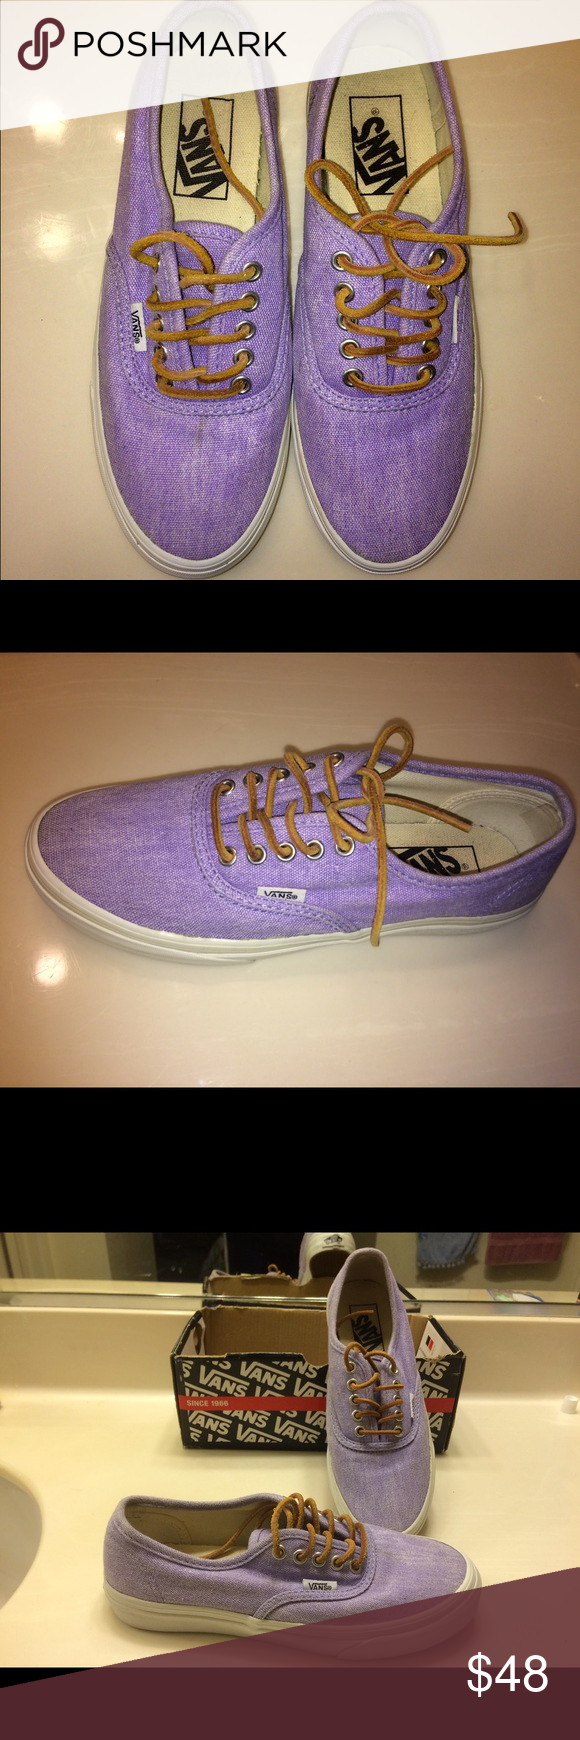 Vans shoes Very cute violet vans! (Authentic slim) worn a few times. Open to offers :) Women size 6.0... Men's size 4!! Vans Shoes Sneakers